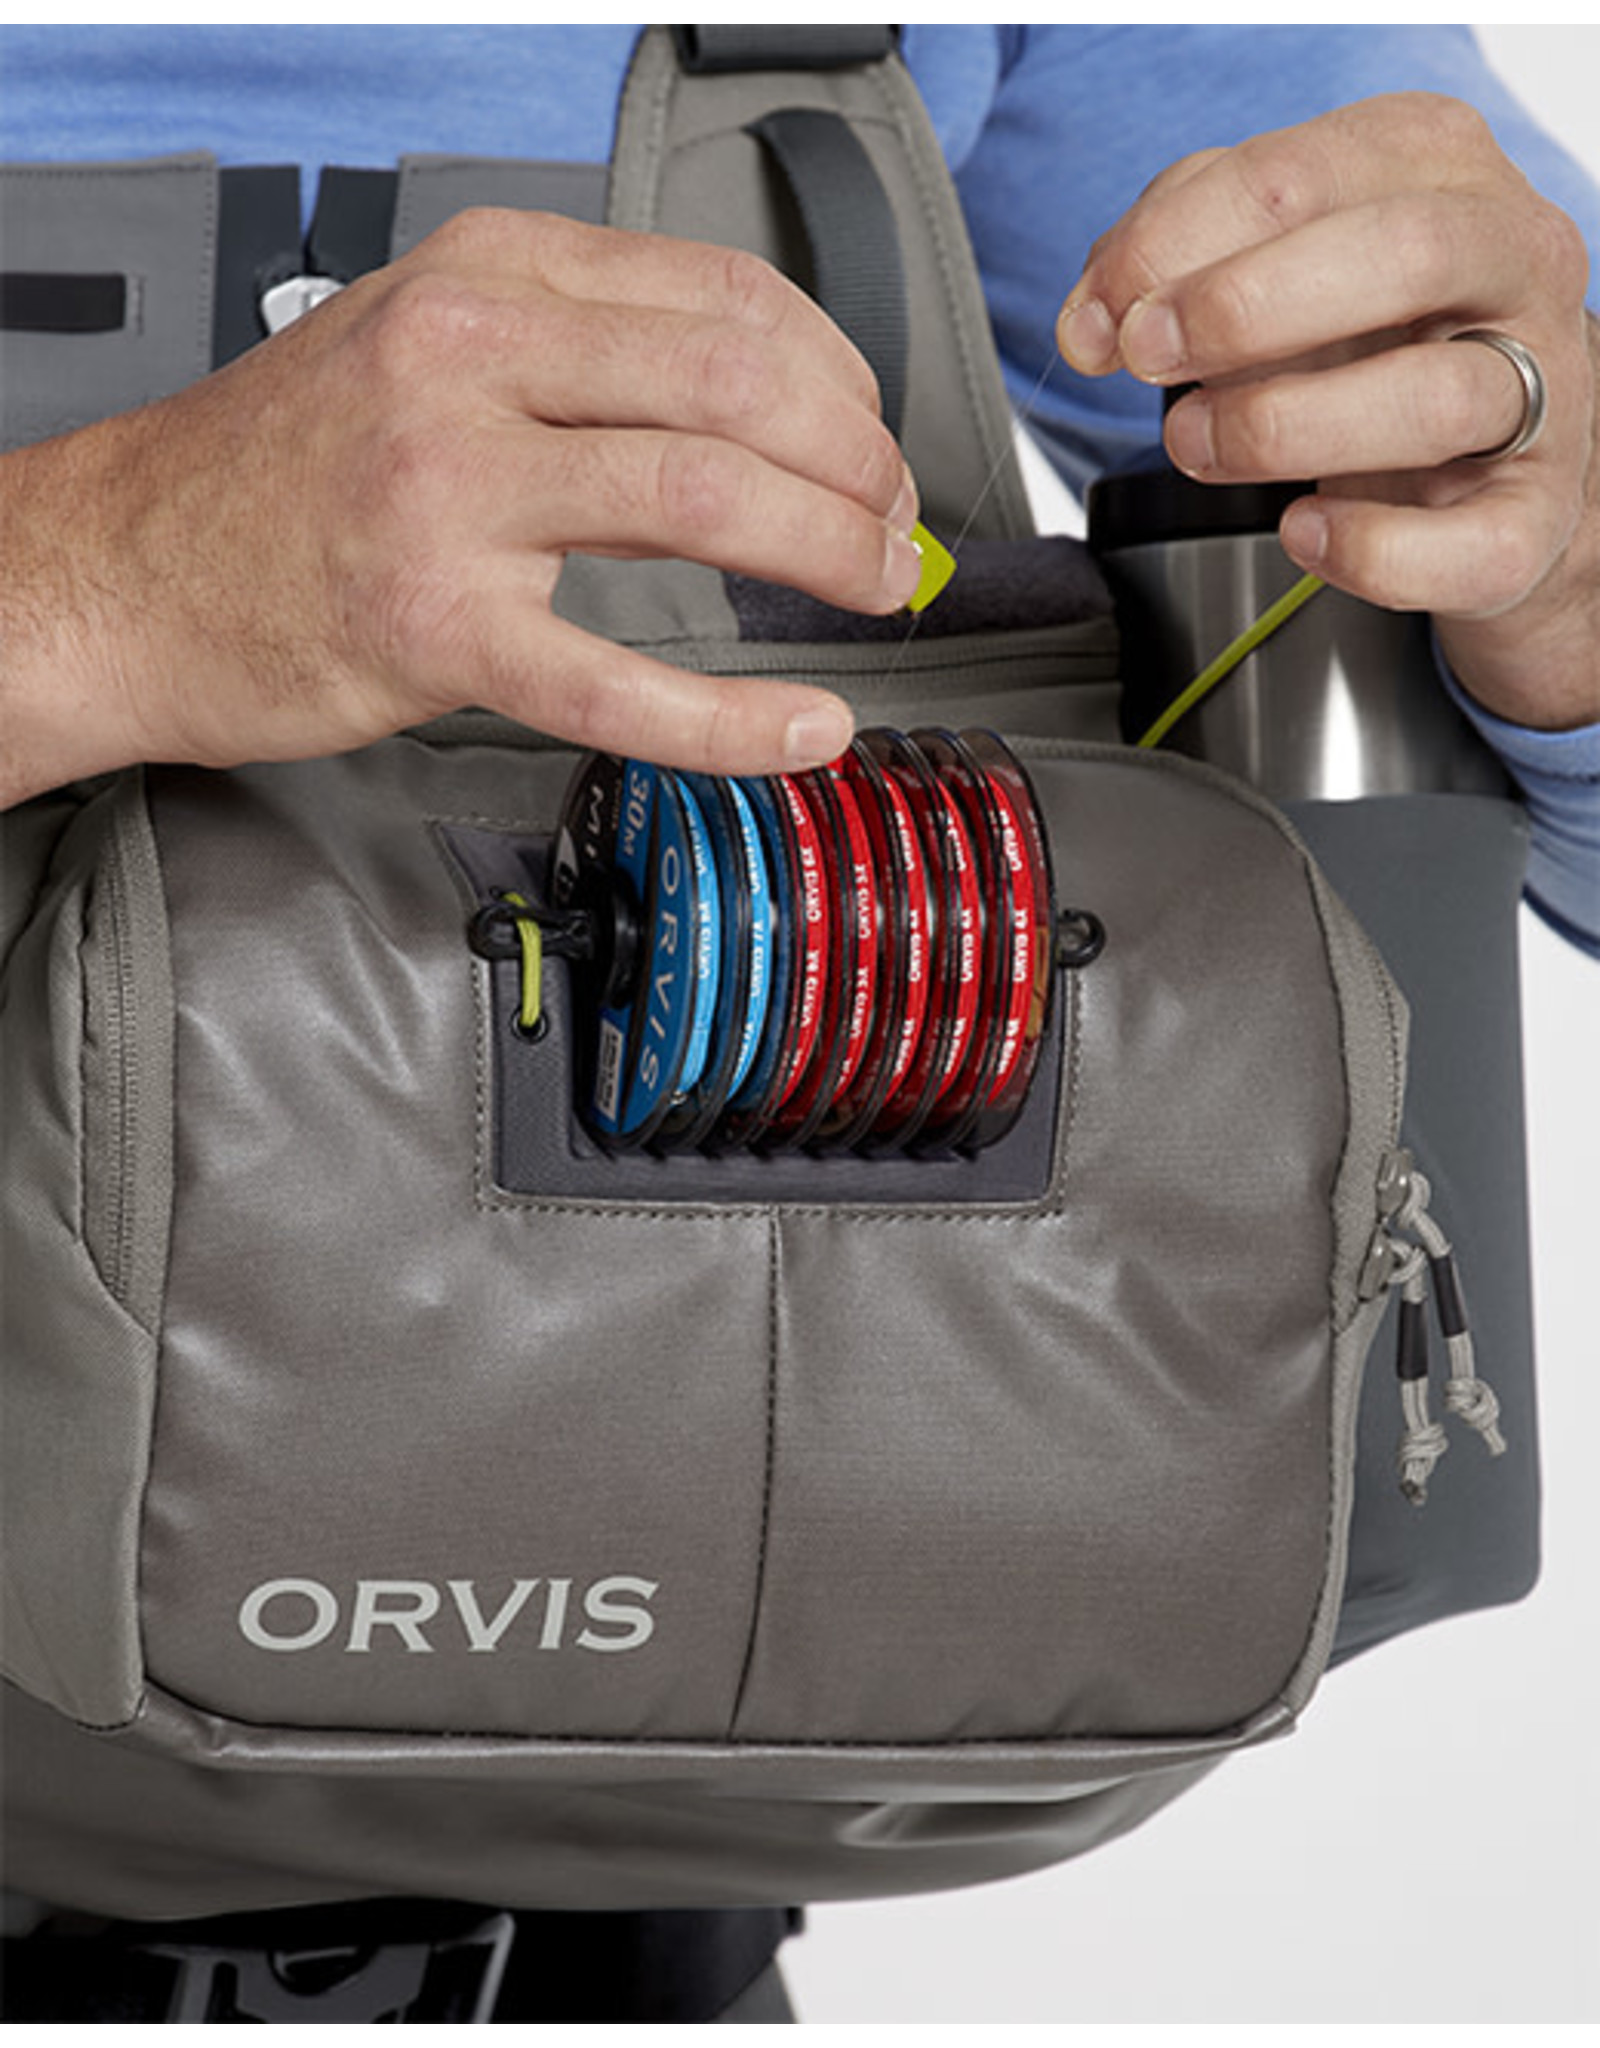 Orvis ORVIS Sling Pack (Fishewear)